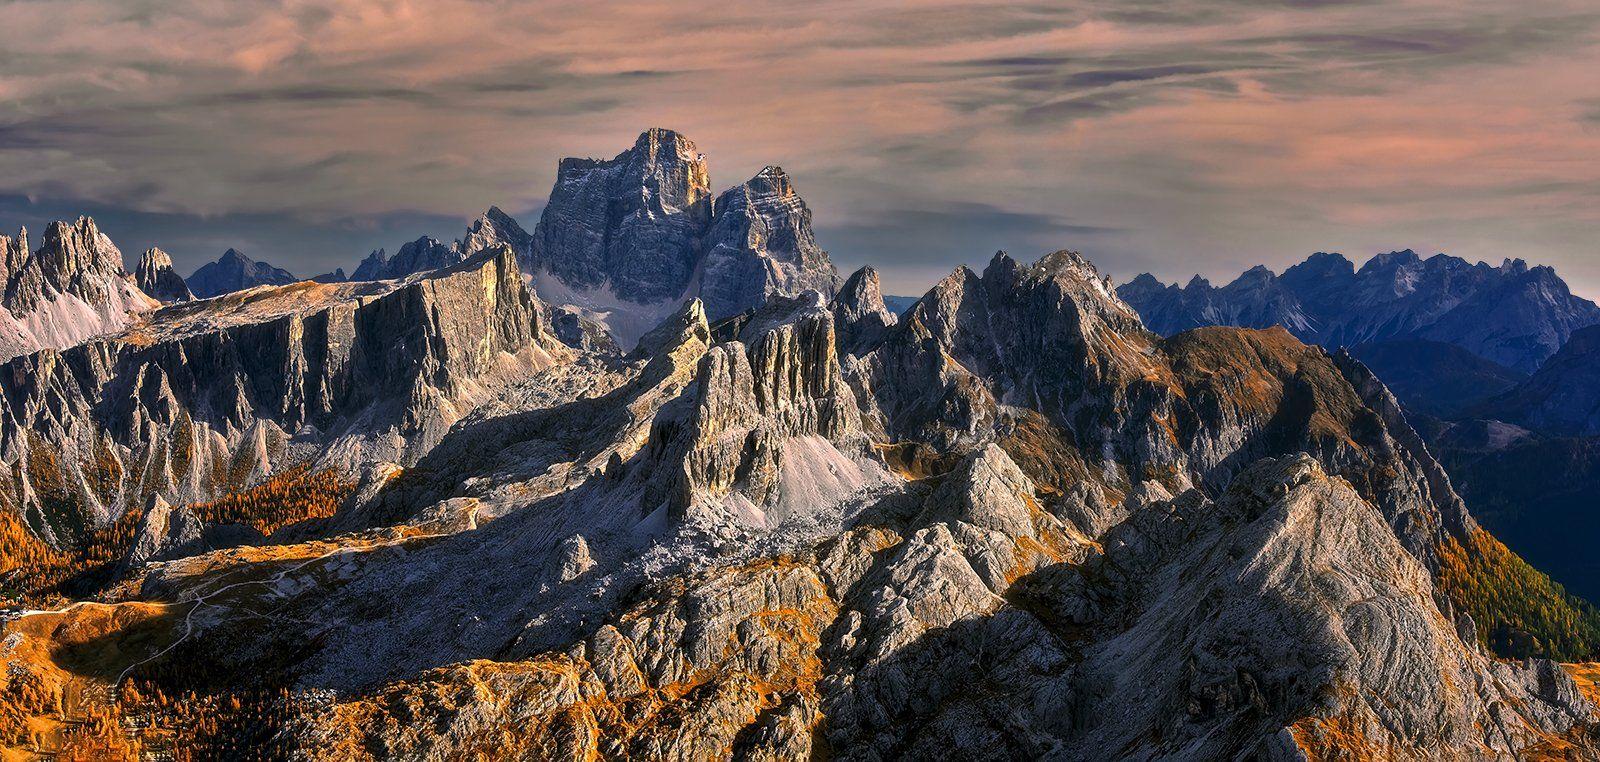 Passo Falzarego, Dolomites, Italy - view from the top of the Rifugio Lagazuoi. panorama, Jan Siemiński